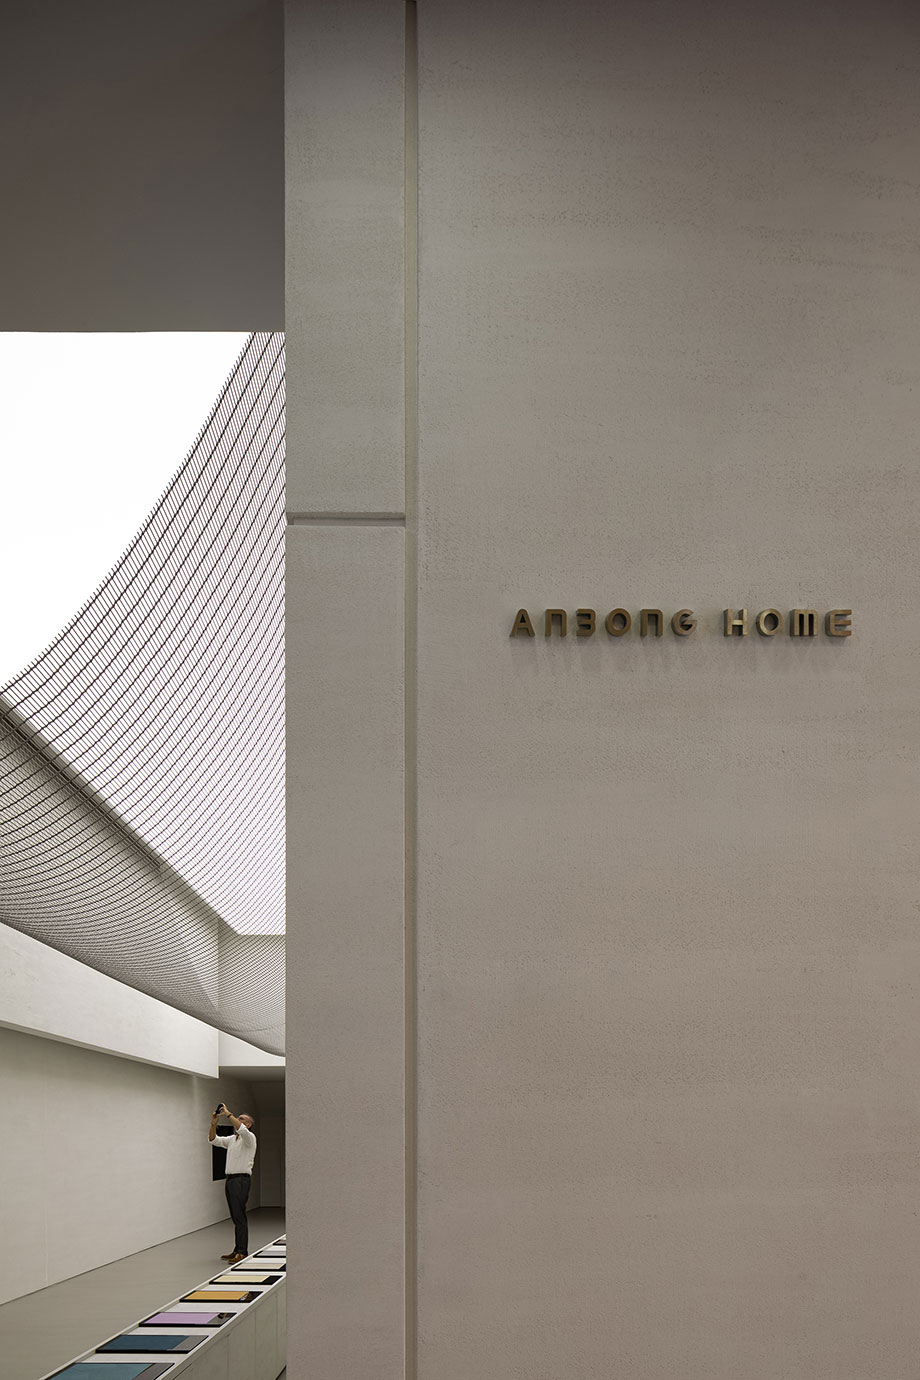 anbong home de ad architecture (1) - foto ouyang yun